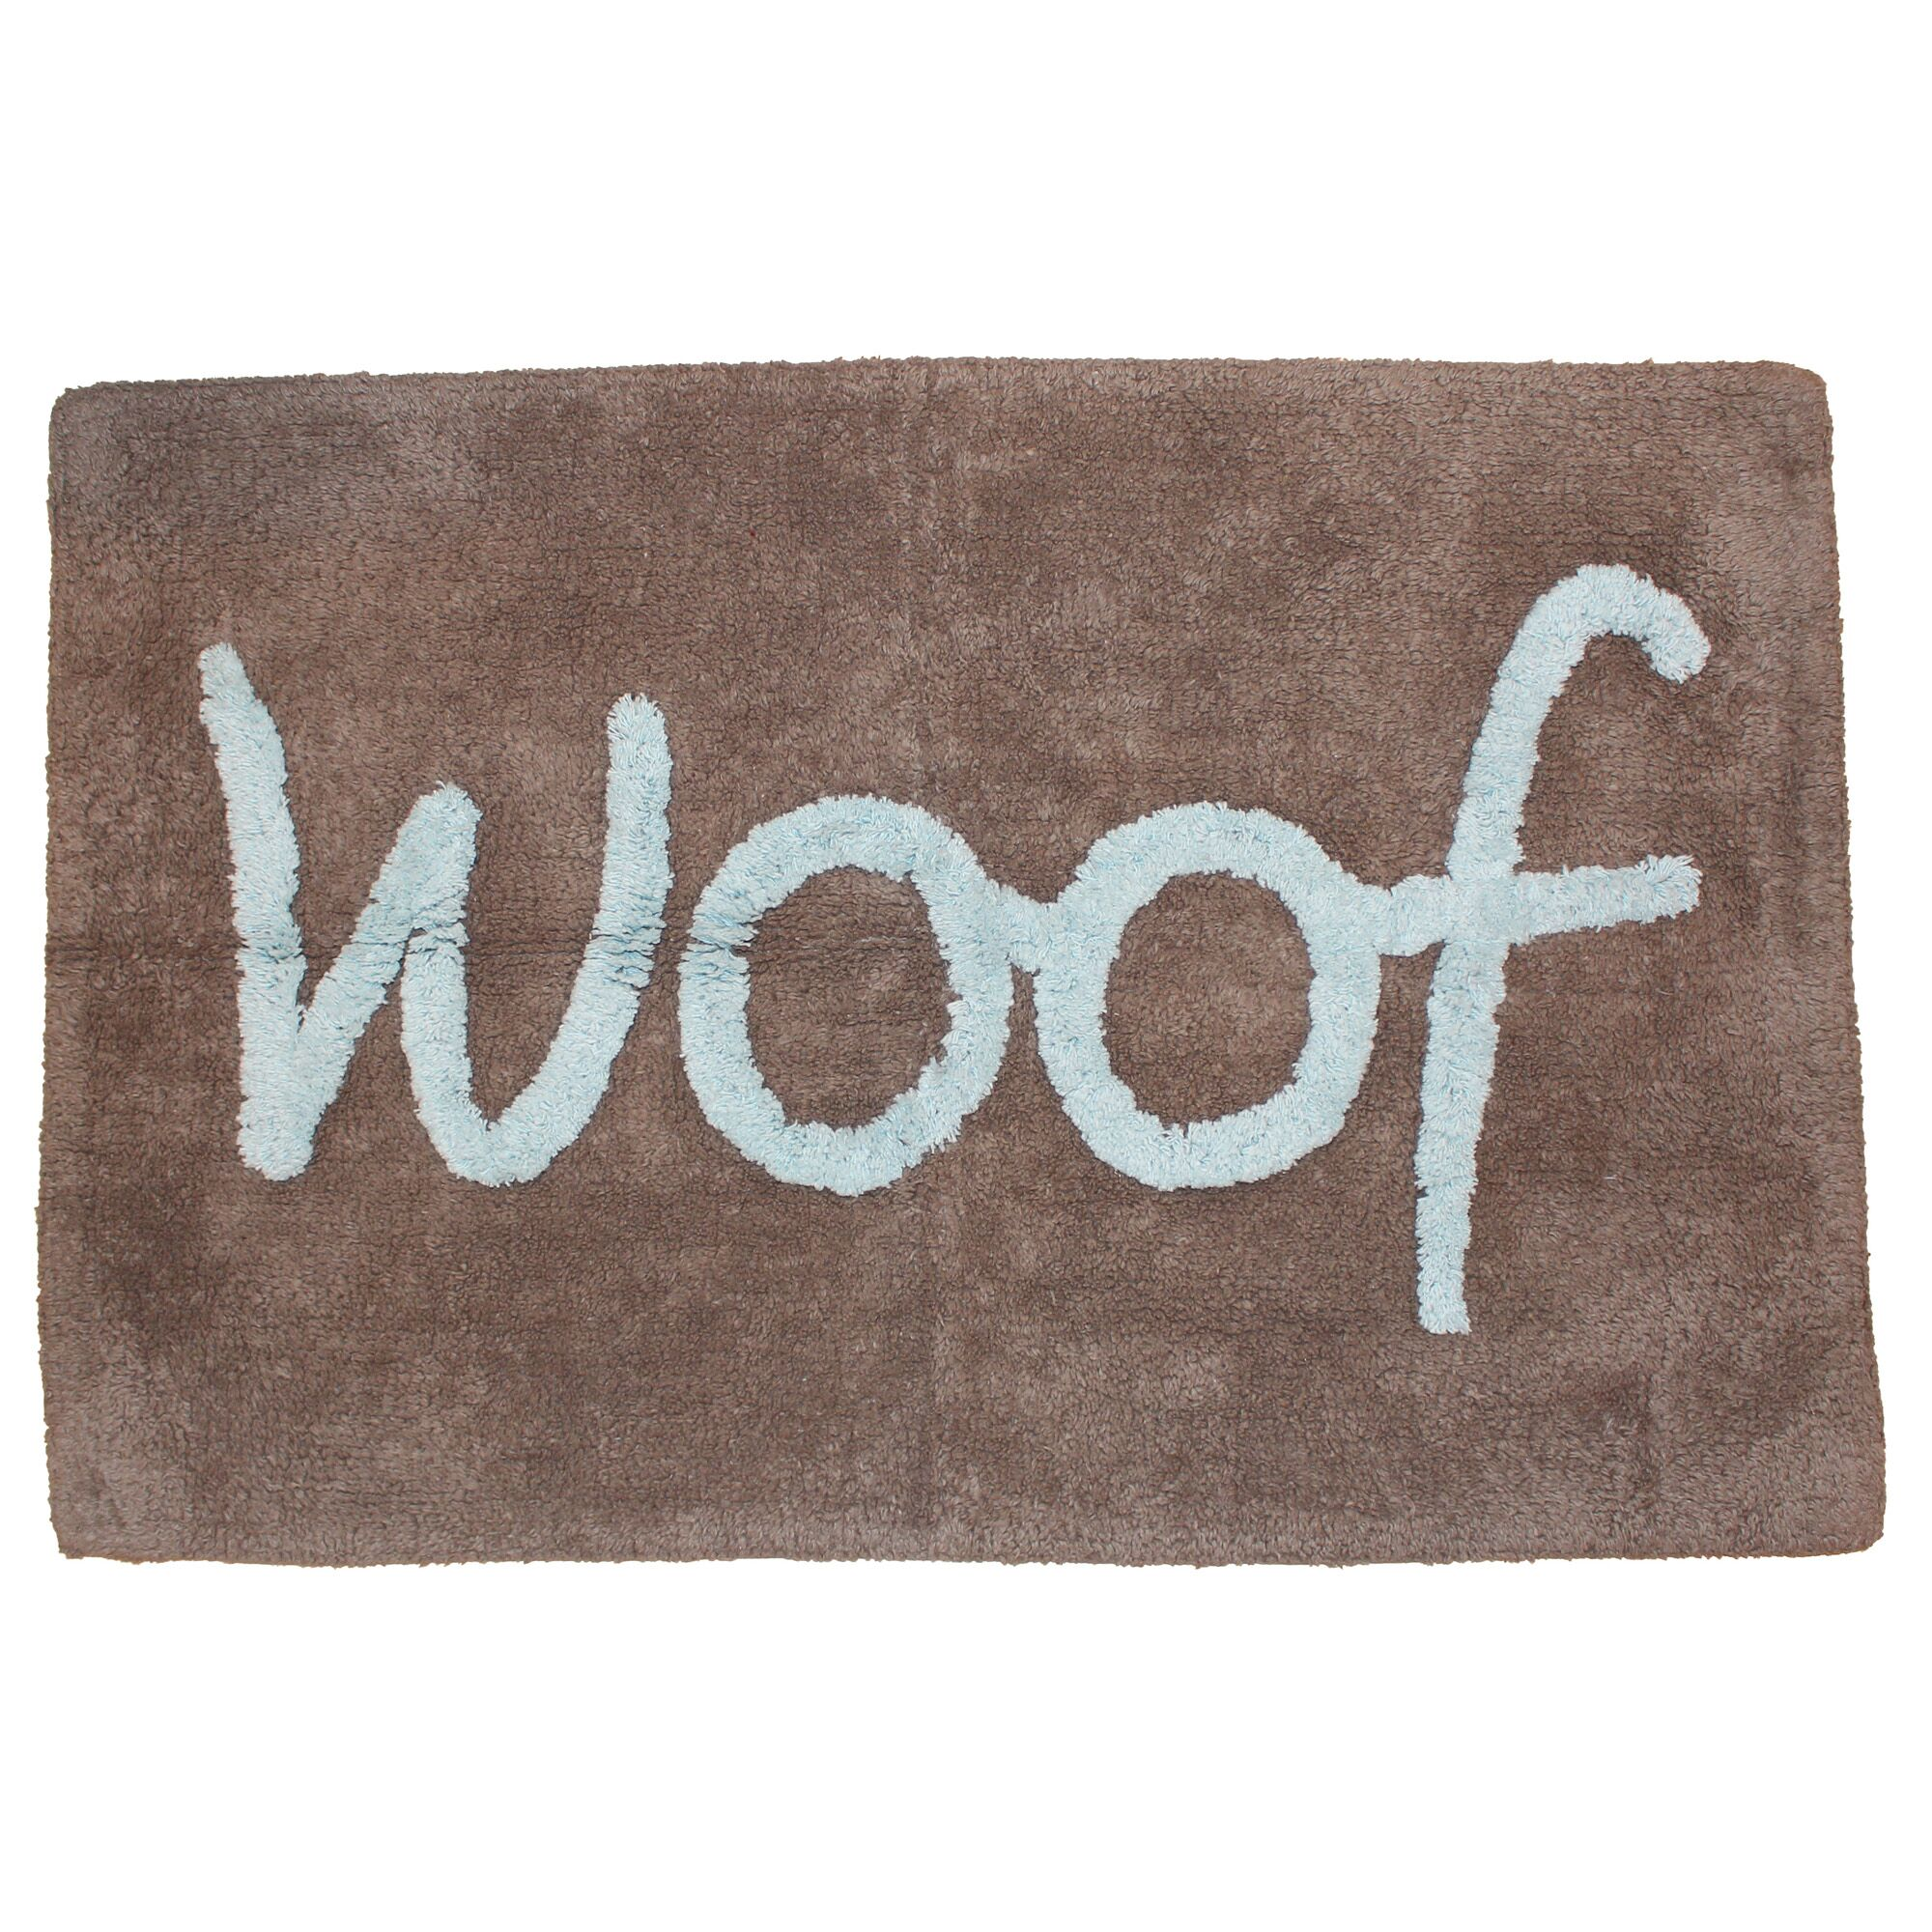 Pinter Woof Tufted Pet Mat/Pad